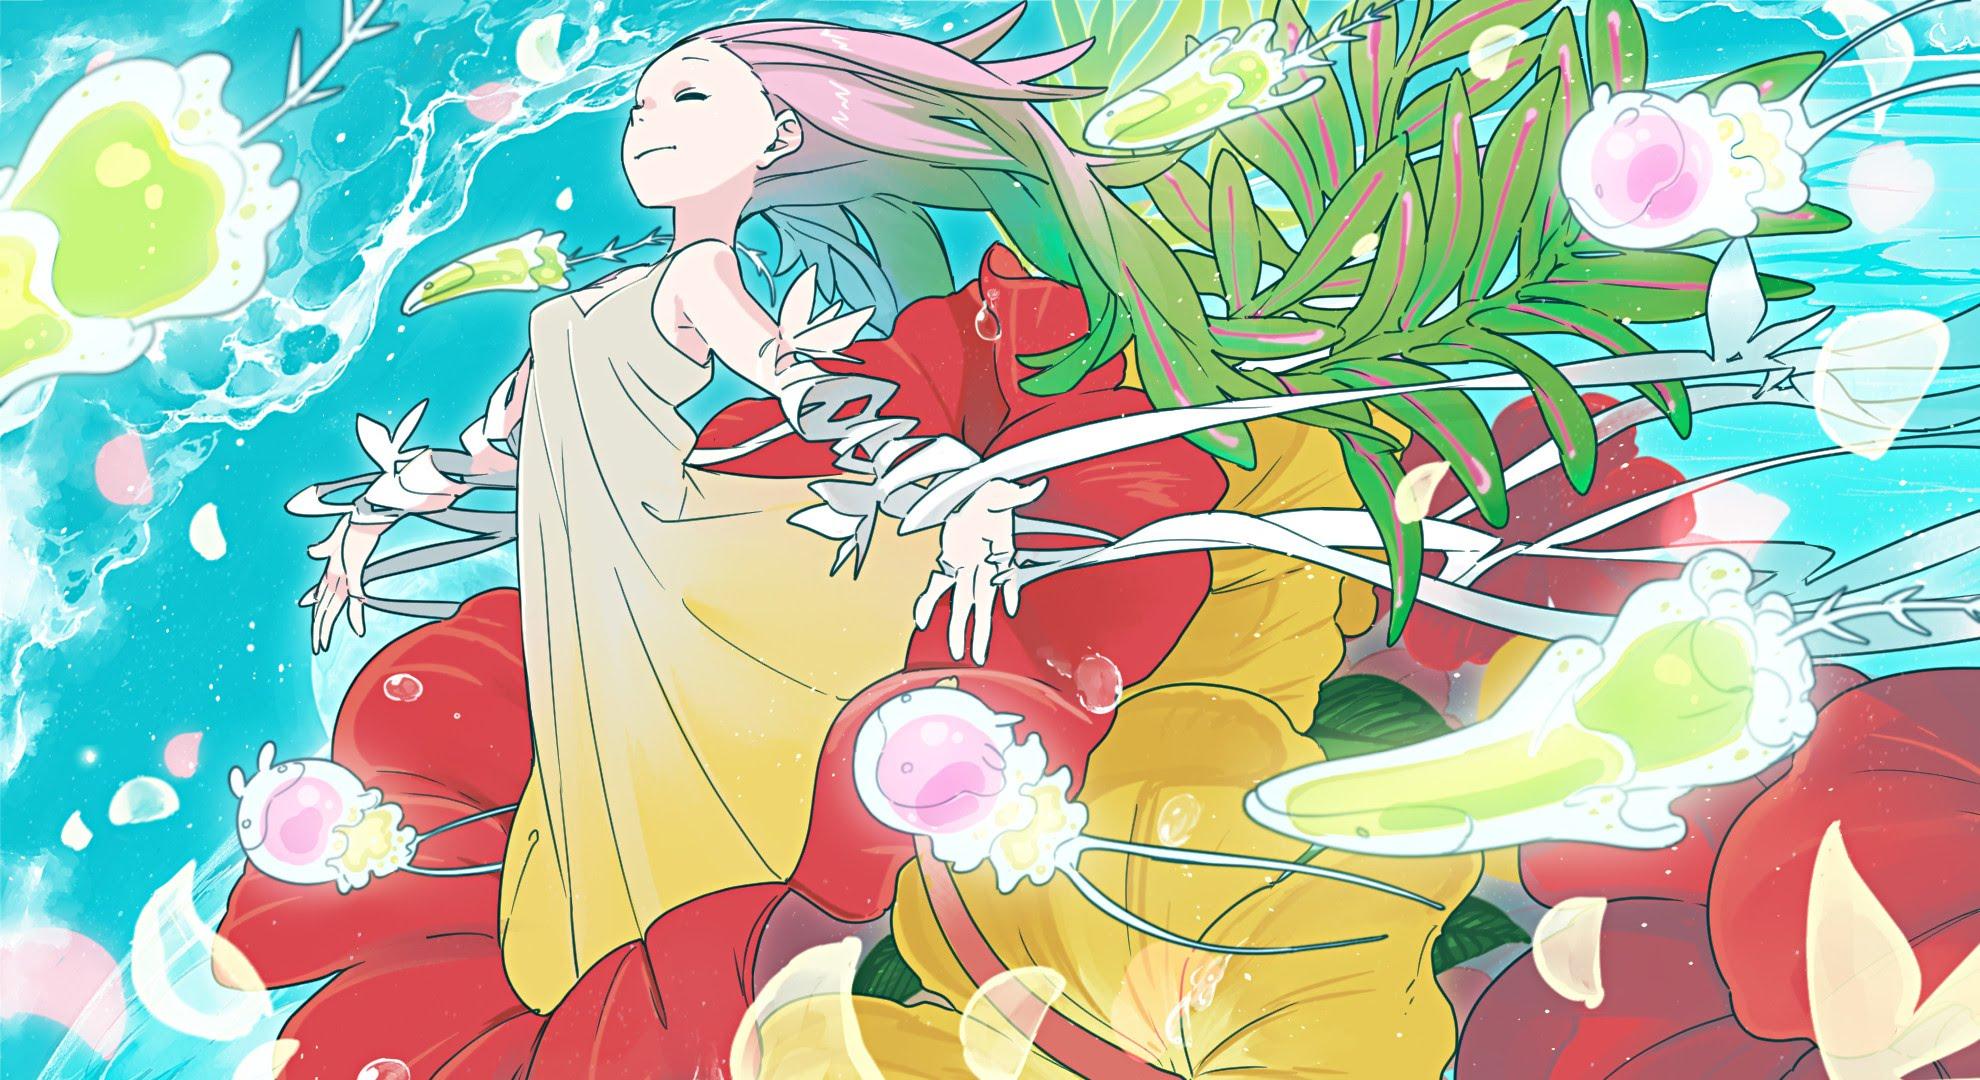 Mili - Colorful [Original artist H△G] - YouTube